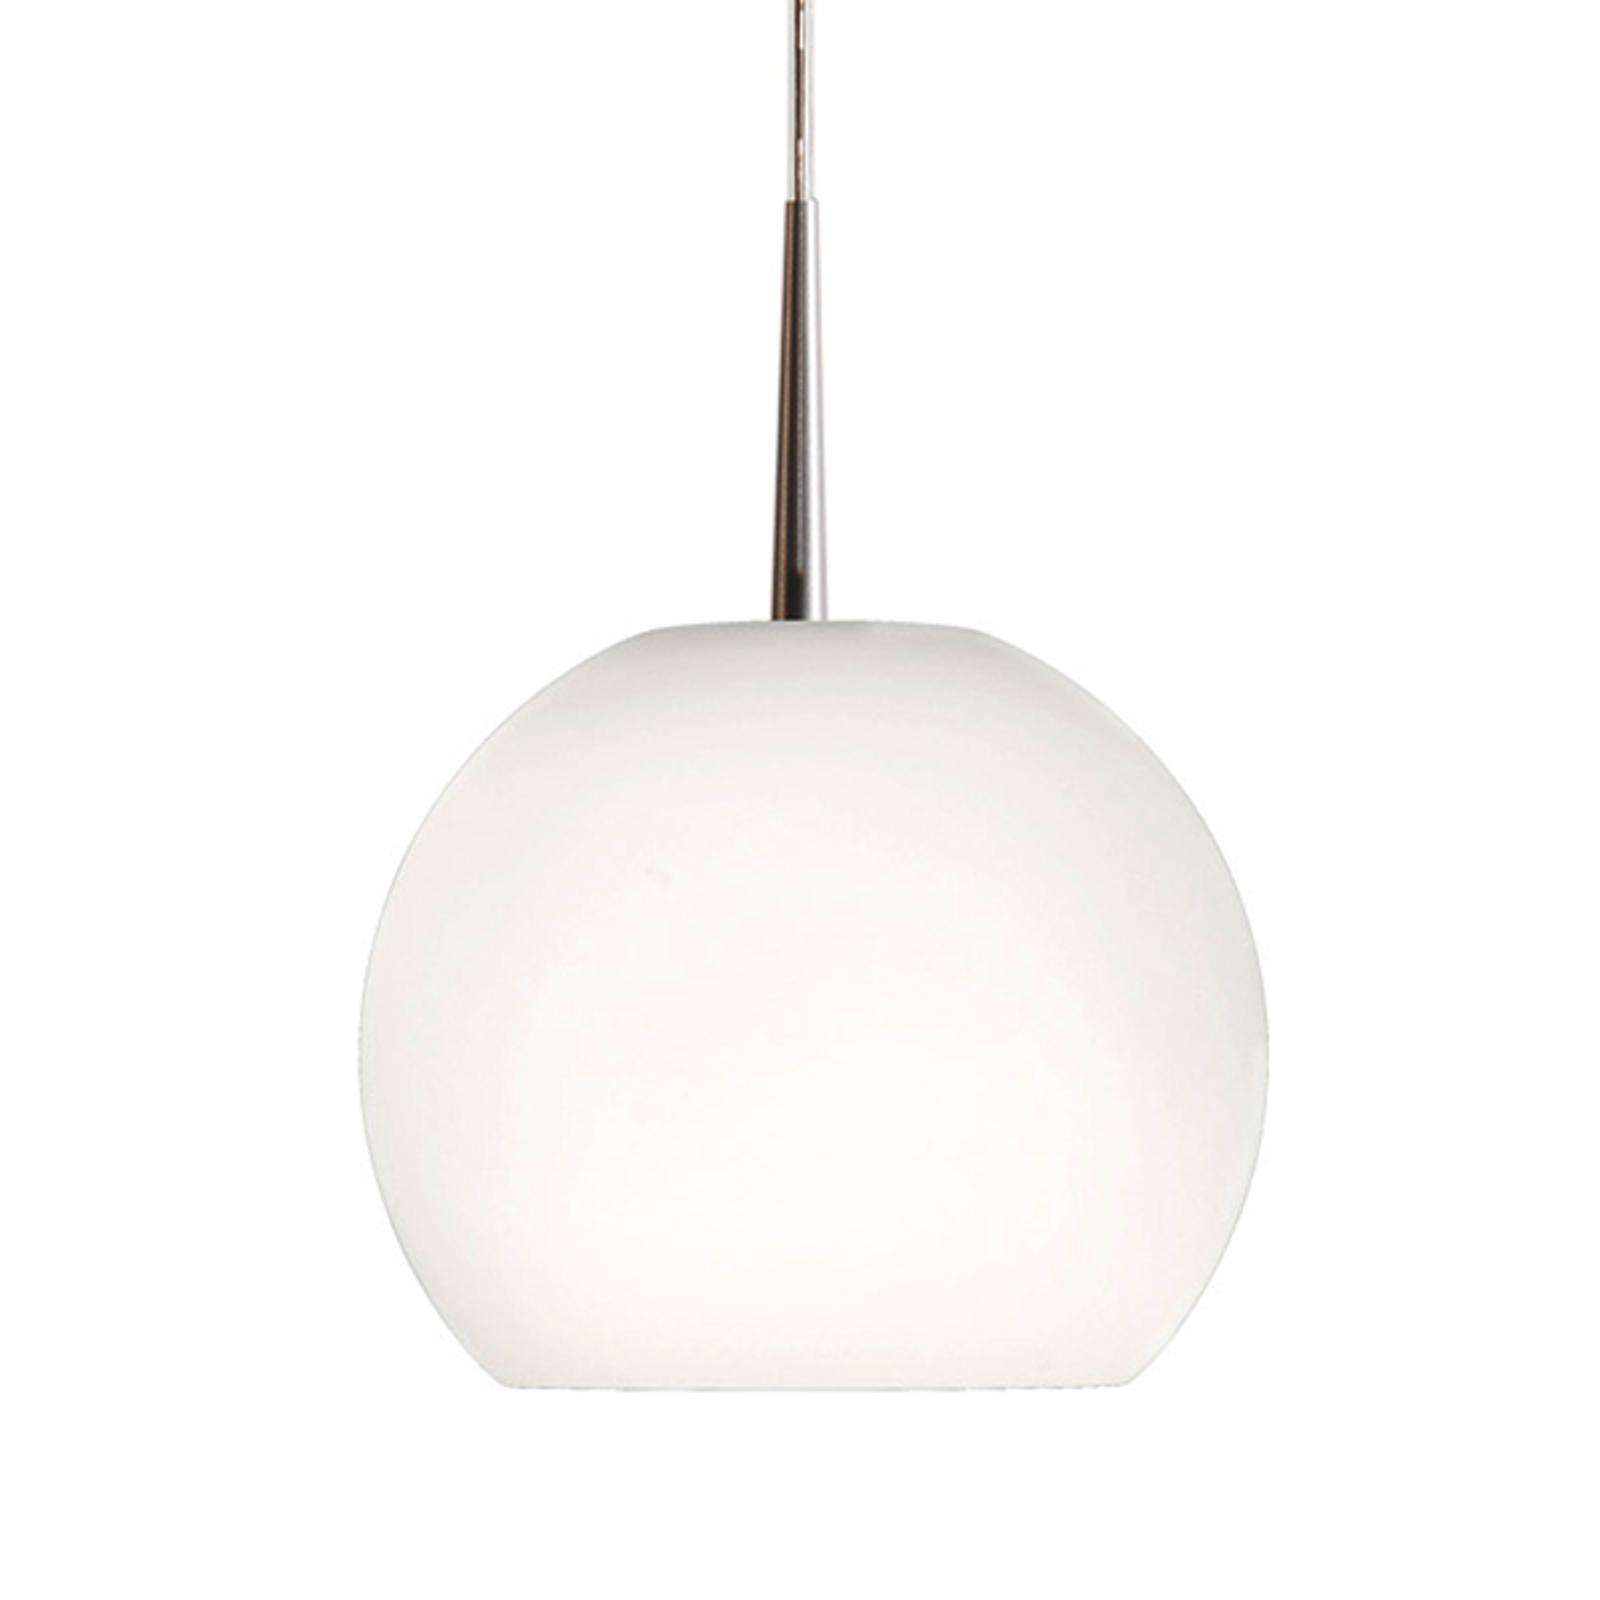 Lampada a sospensione Casablanca Ball a 1 luce